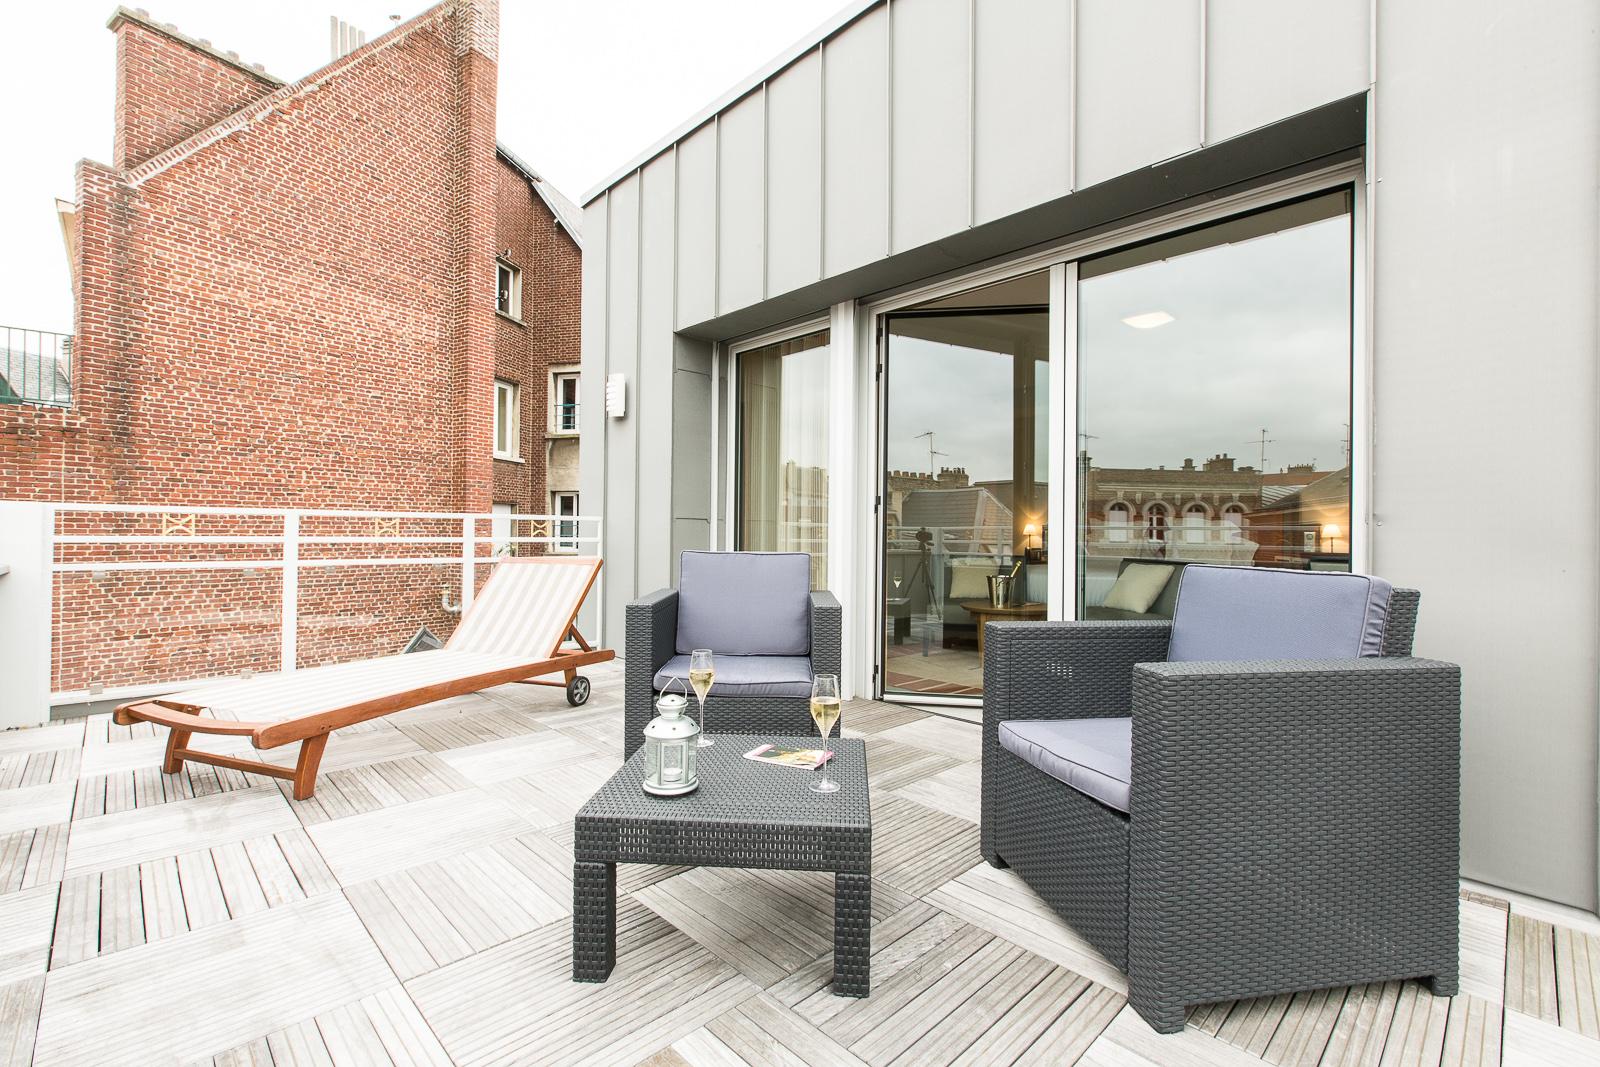 Hôtel Marotte - appartement terrasse